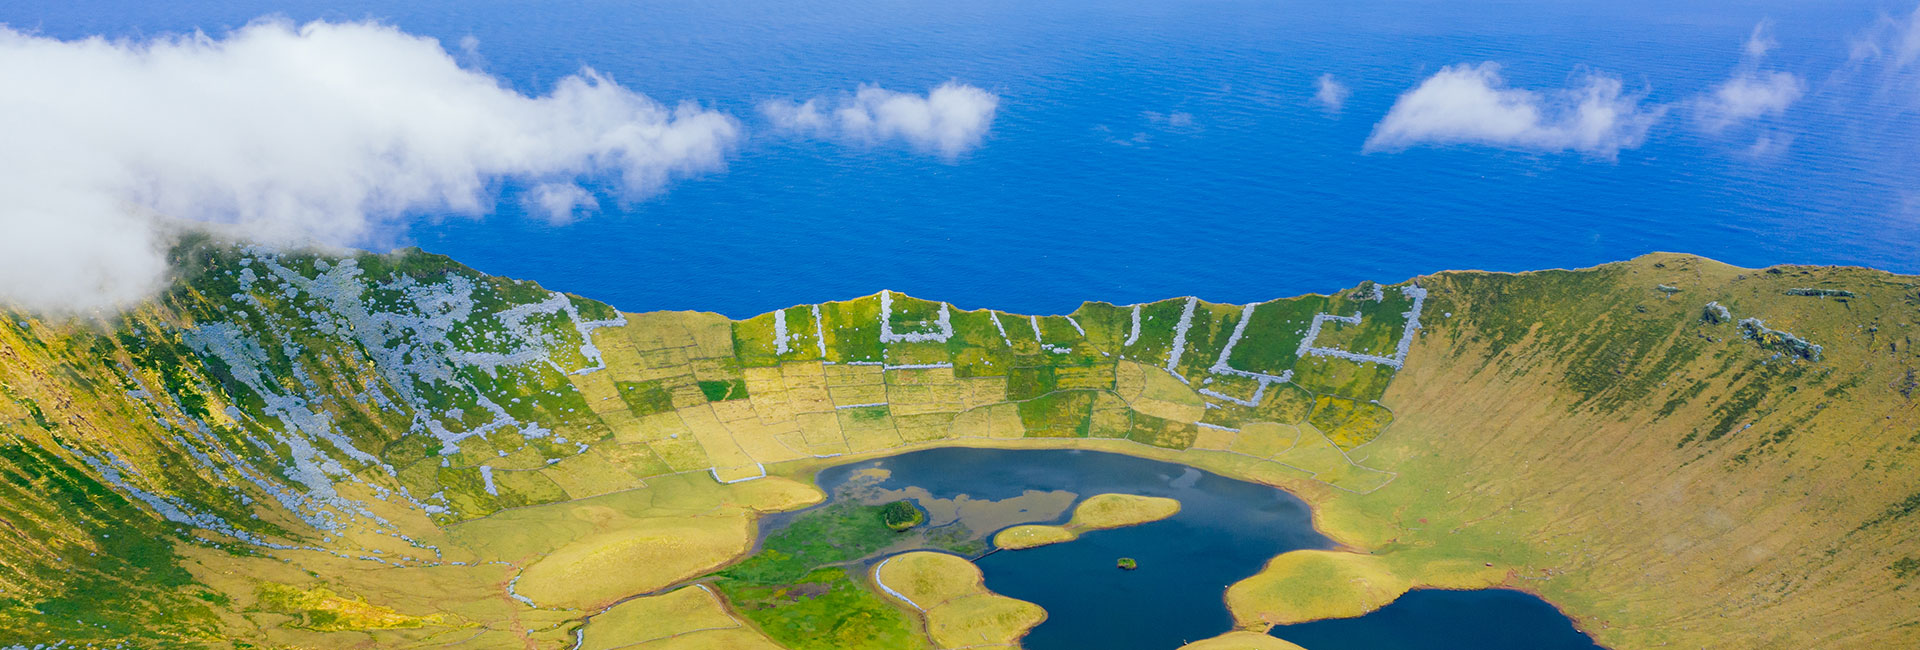 6_Galapagos_Island